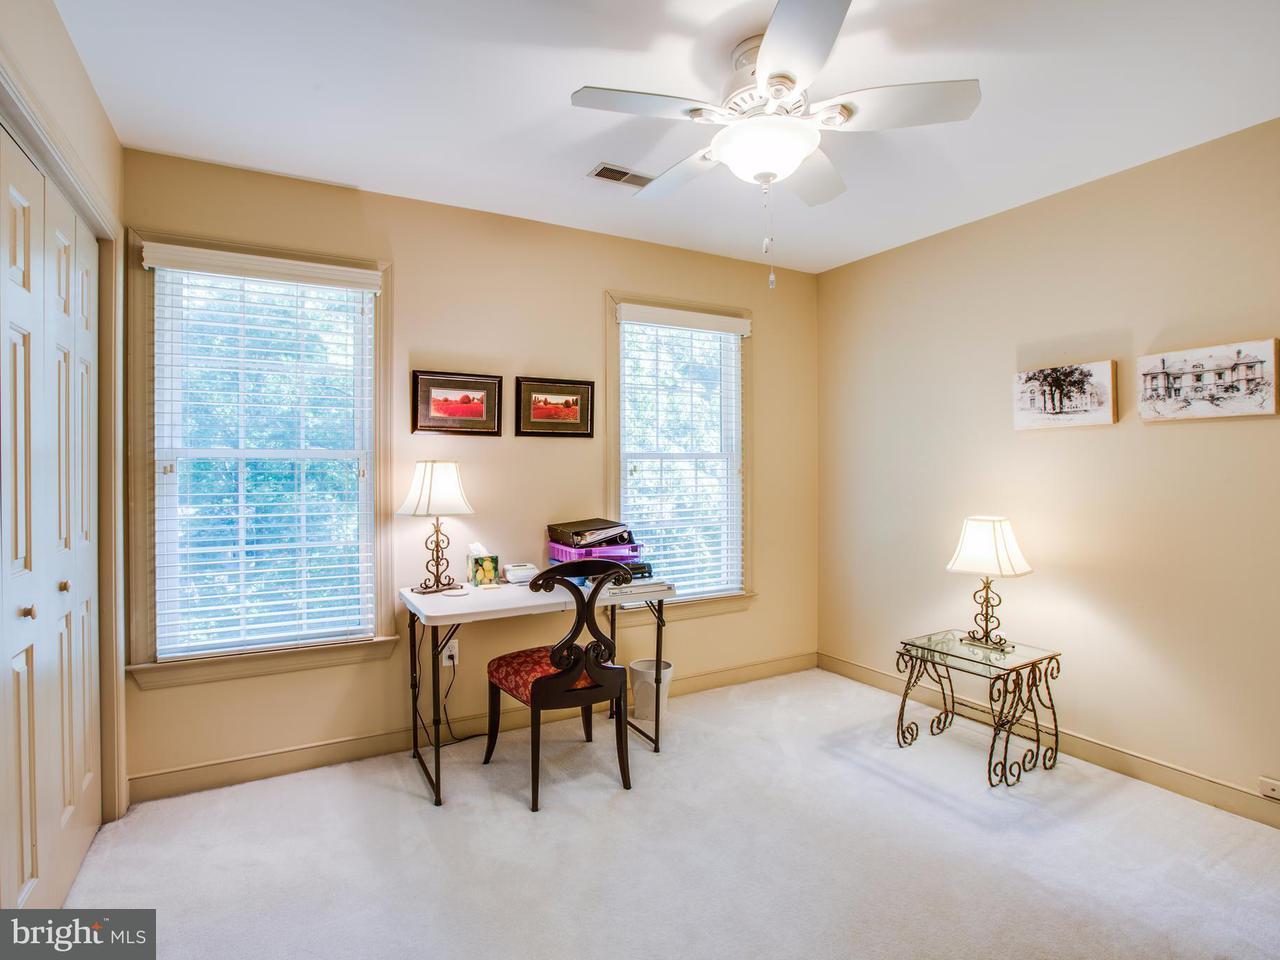 Additional photo for property listing at 110 Poplar Drive 110 Poplar Drive Fredericksburg, Virginia 22401 Estados Unidos